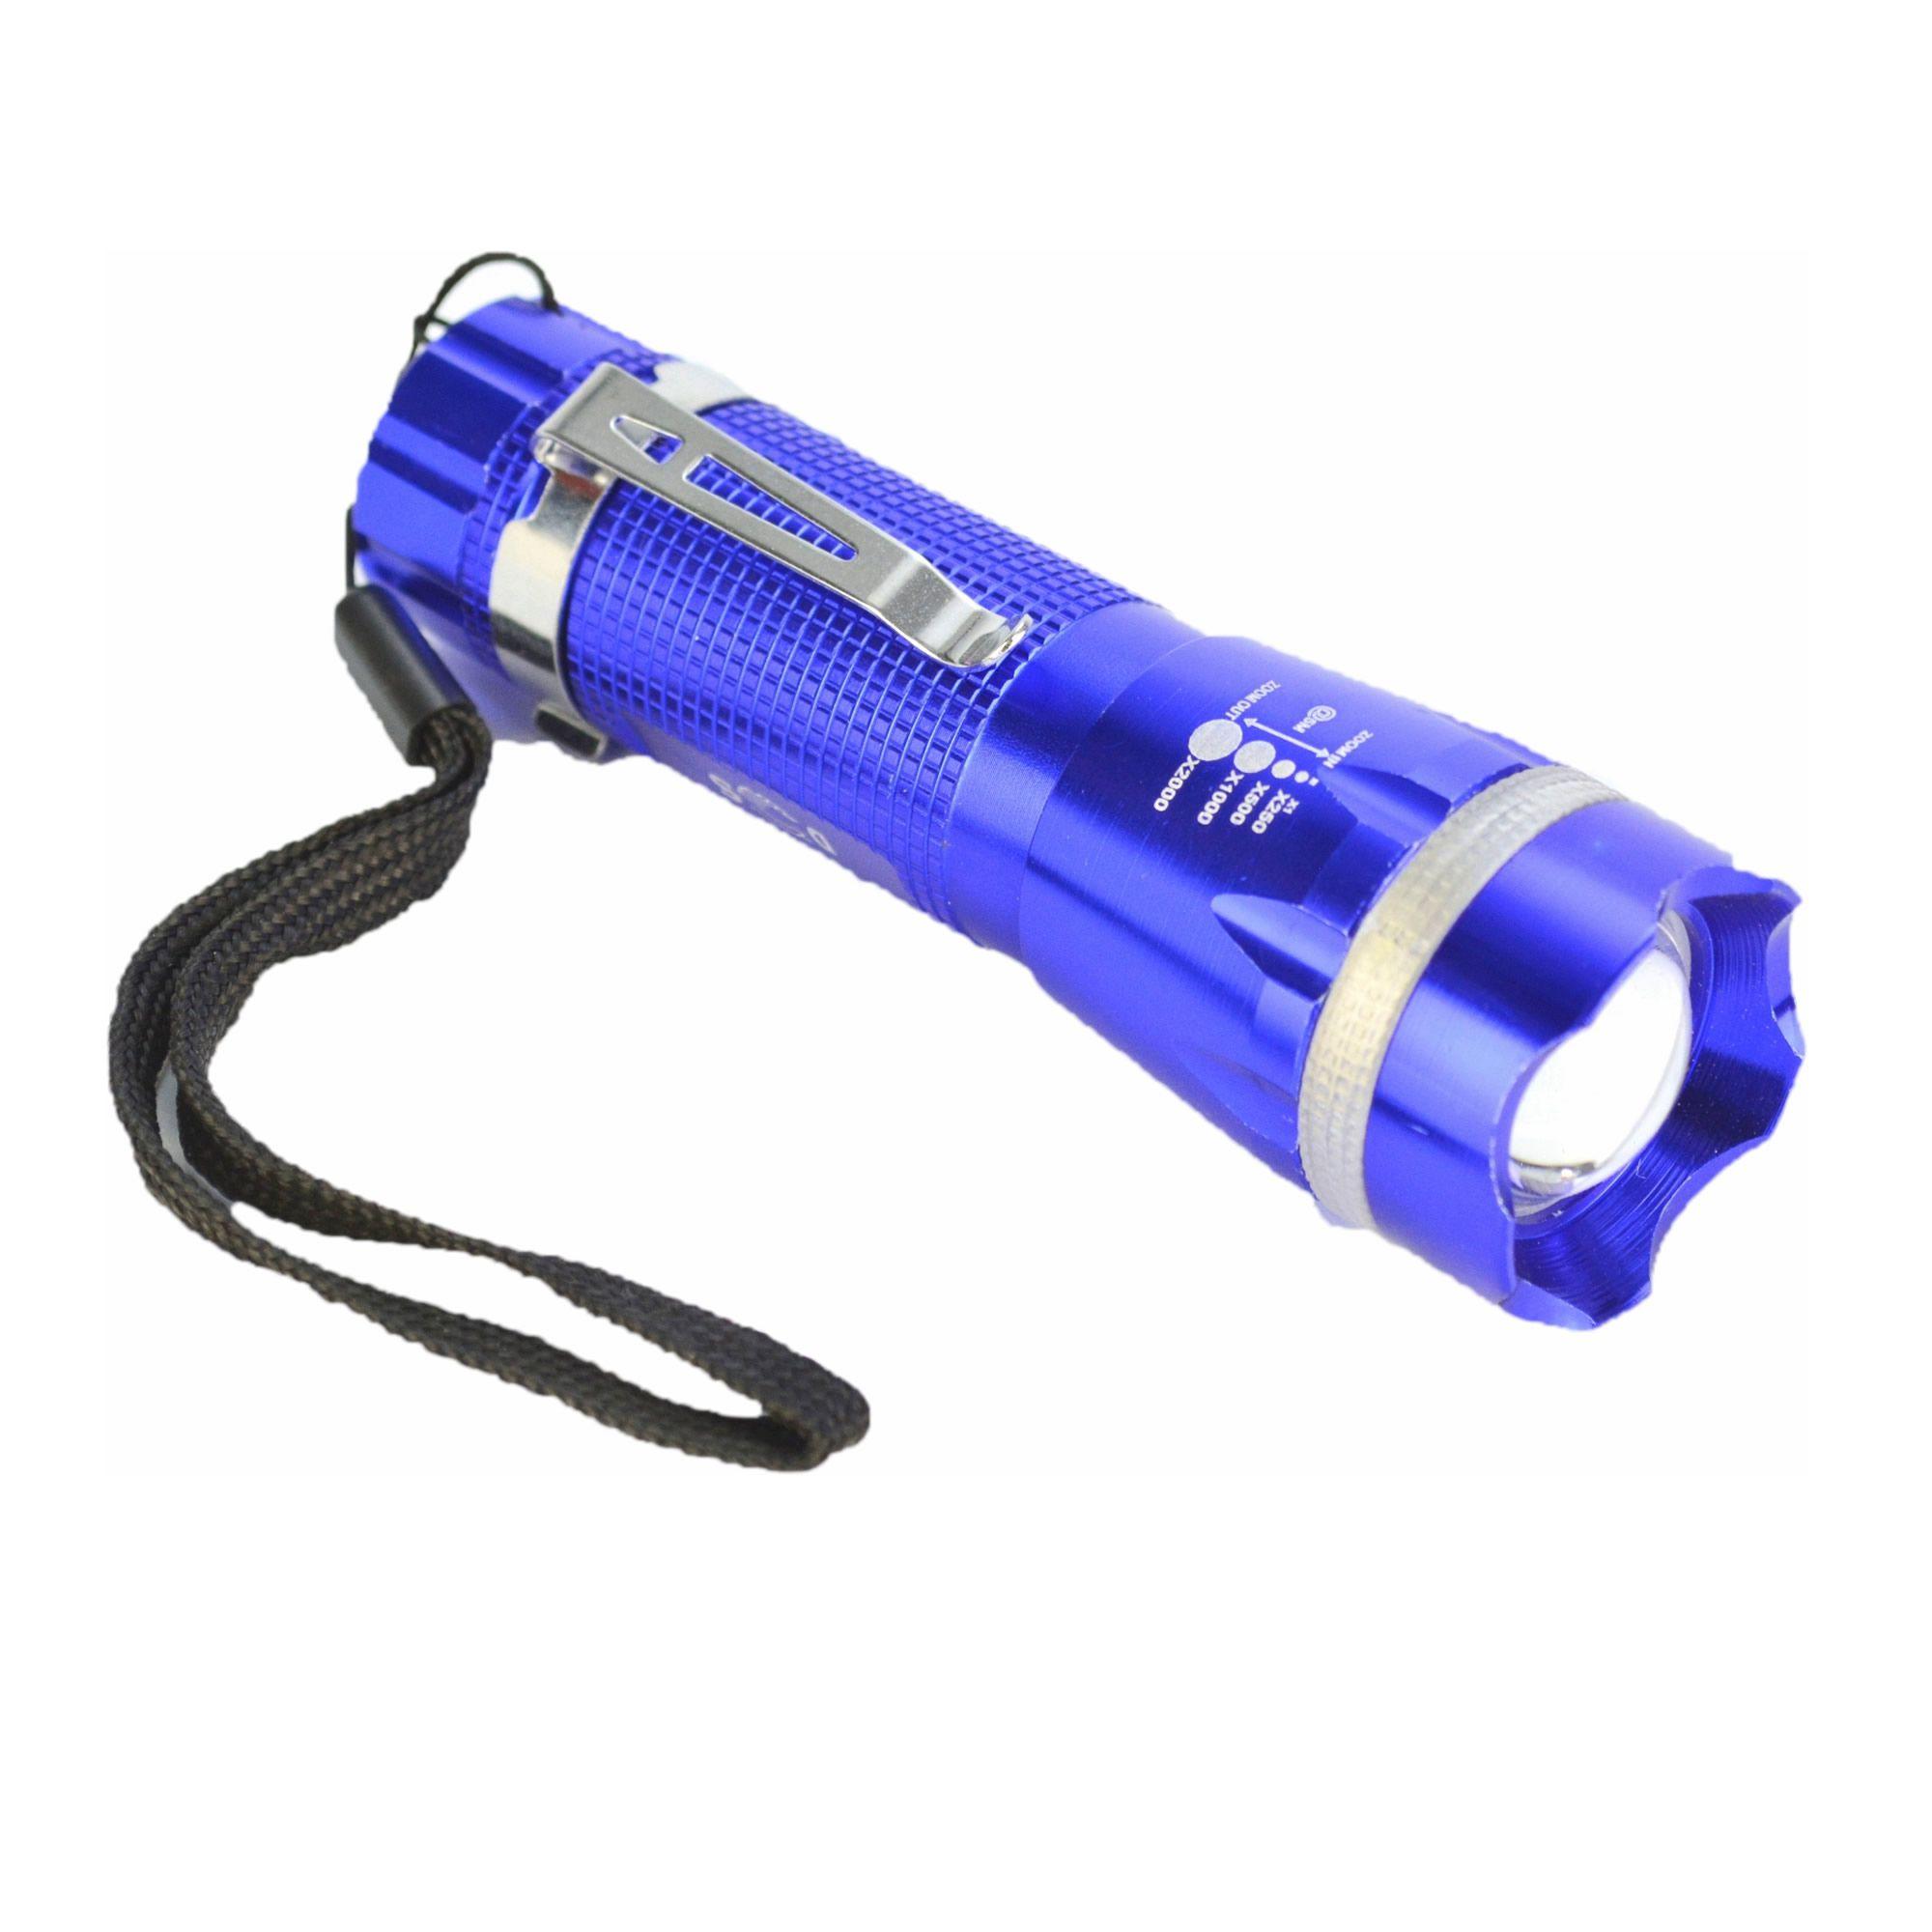 Lanterna Tática Policial LED Pilhas 10cm Azul CBRN11483